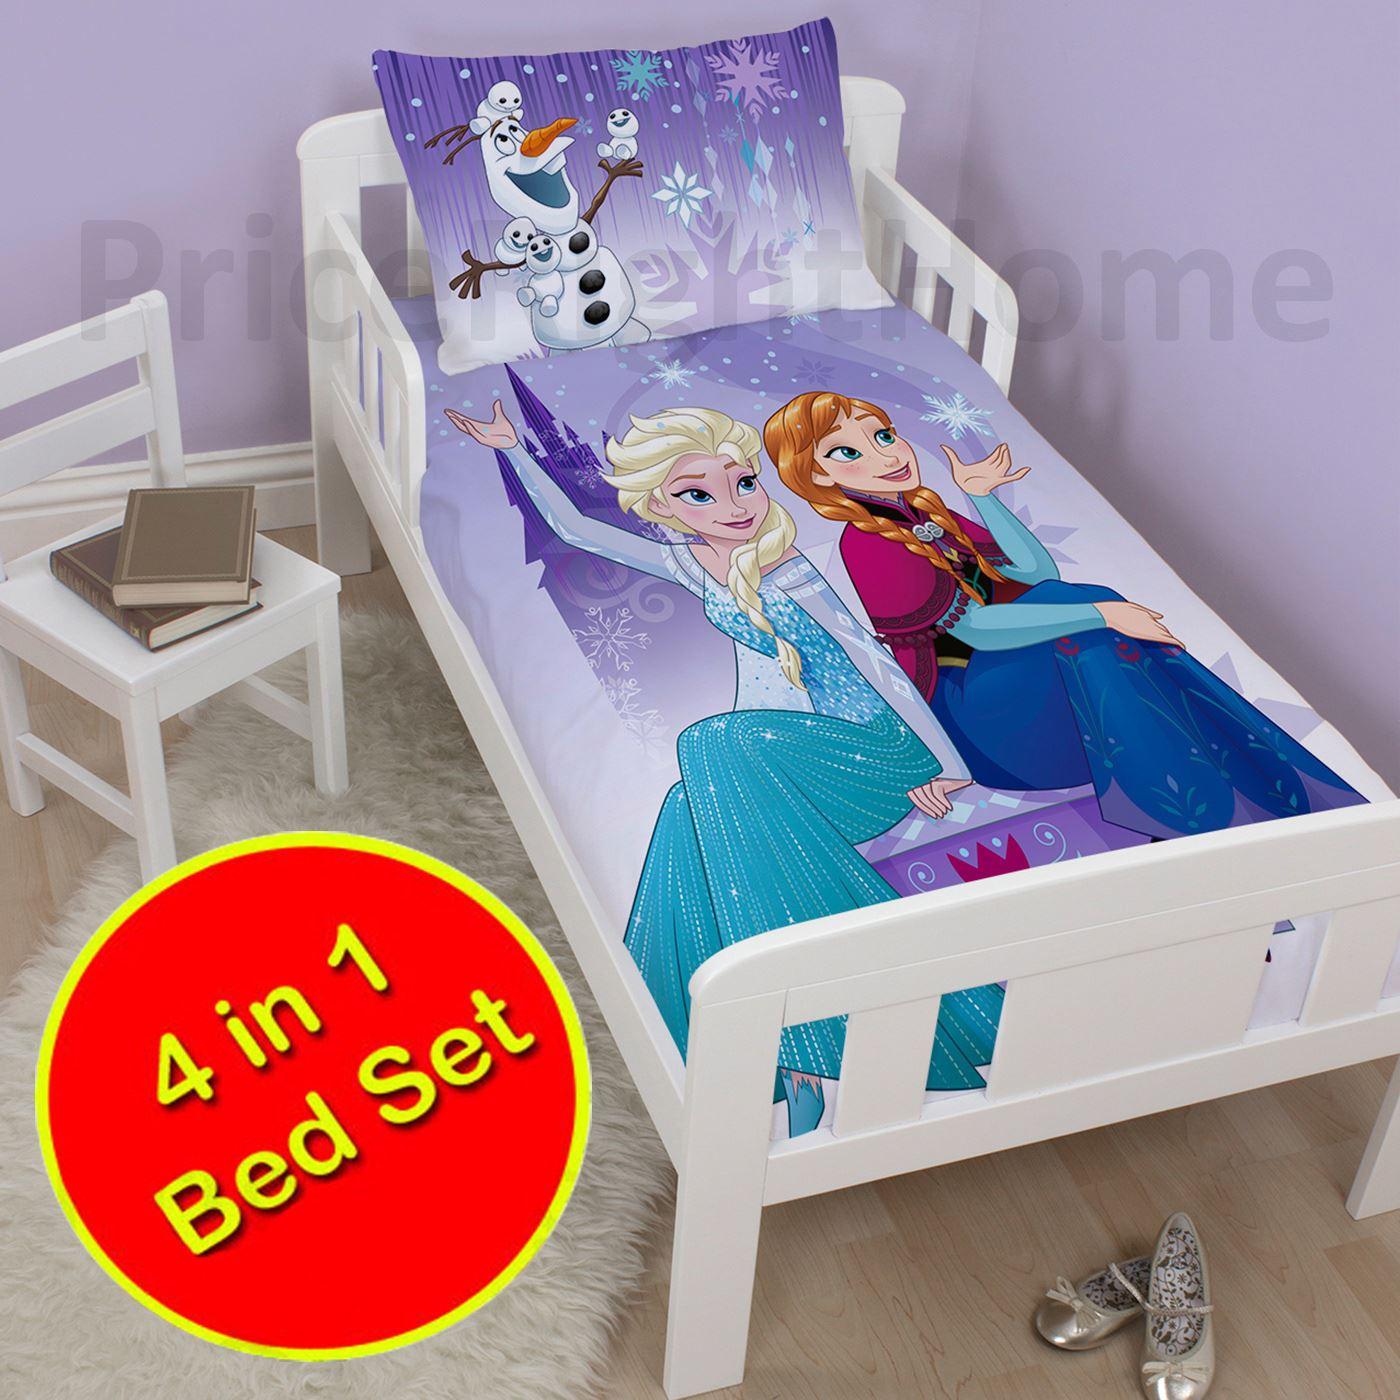 Disney Amp Character 4 In 1 Toddler Bedding Bundles Duvet Pillow Covers Ebay